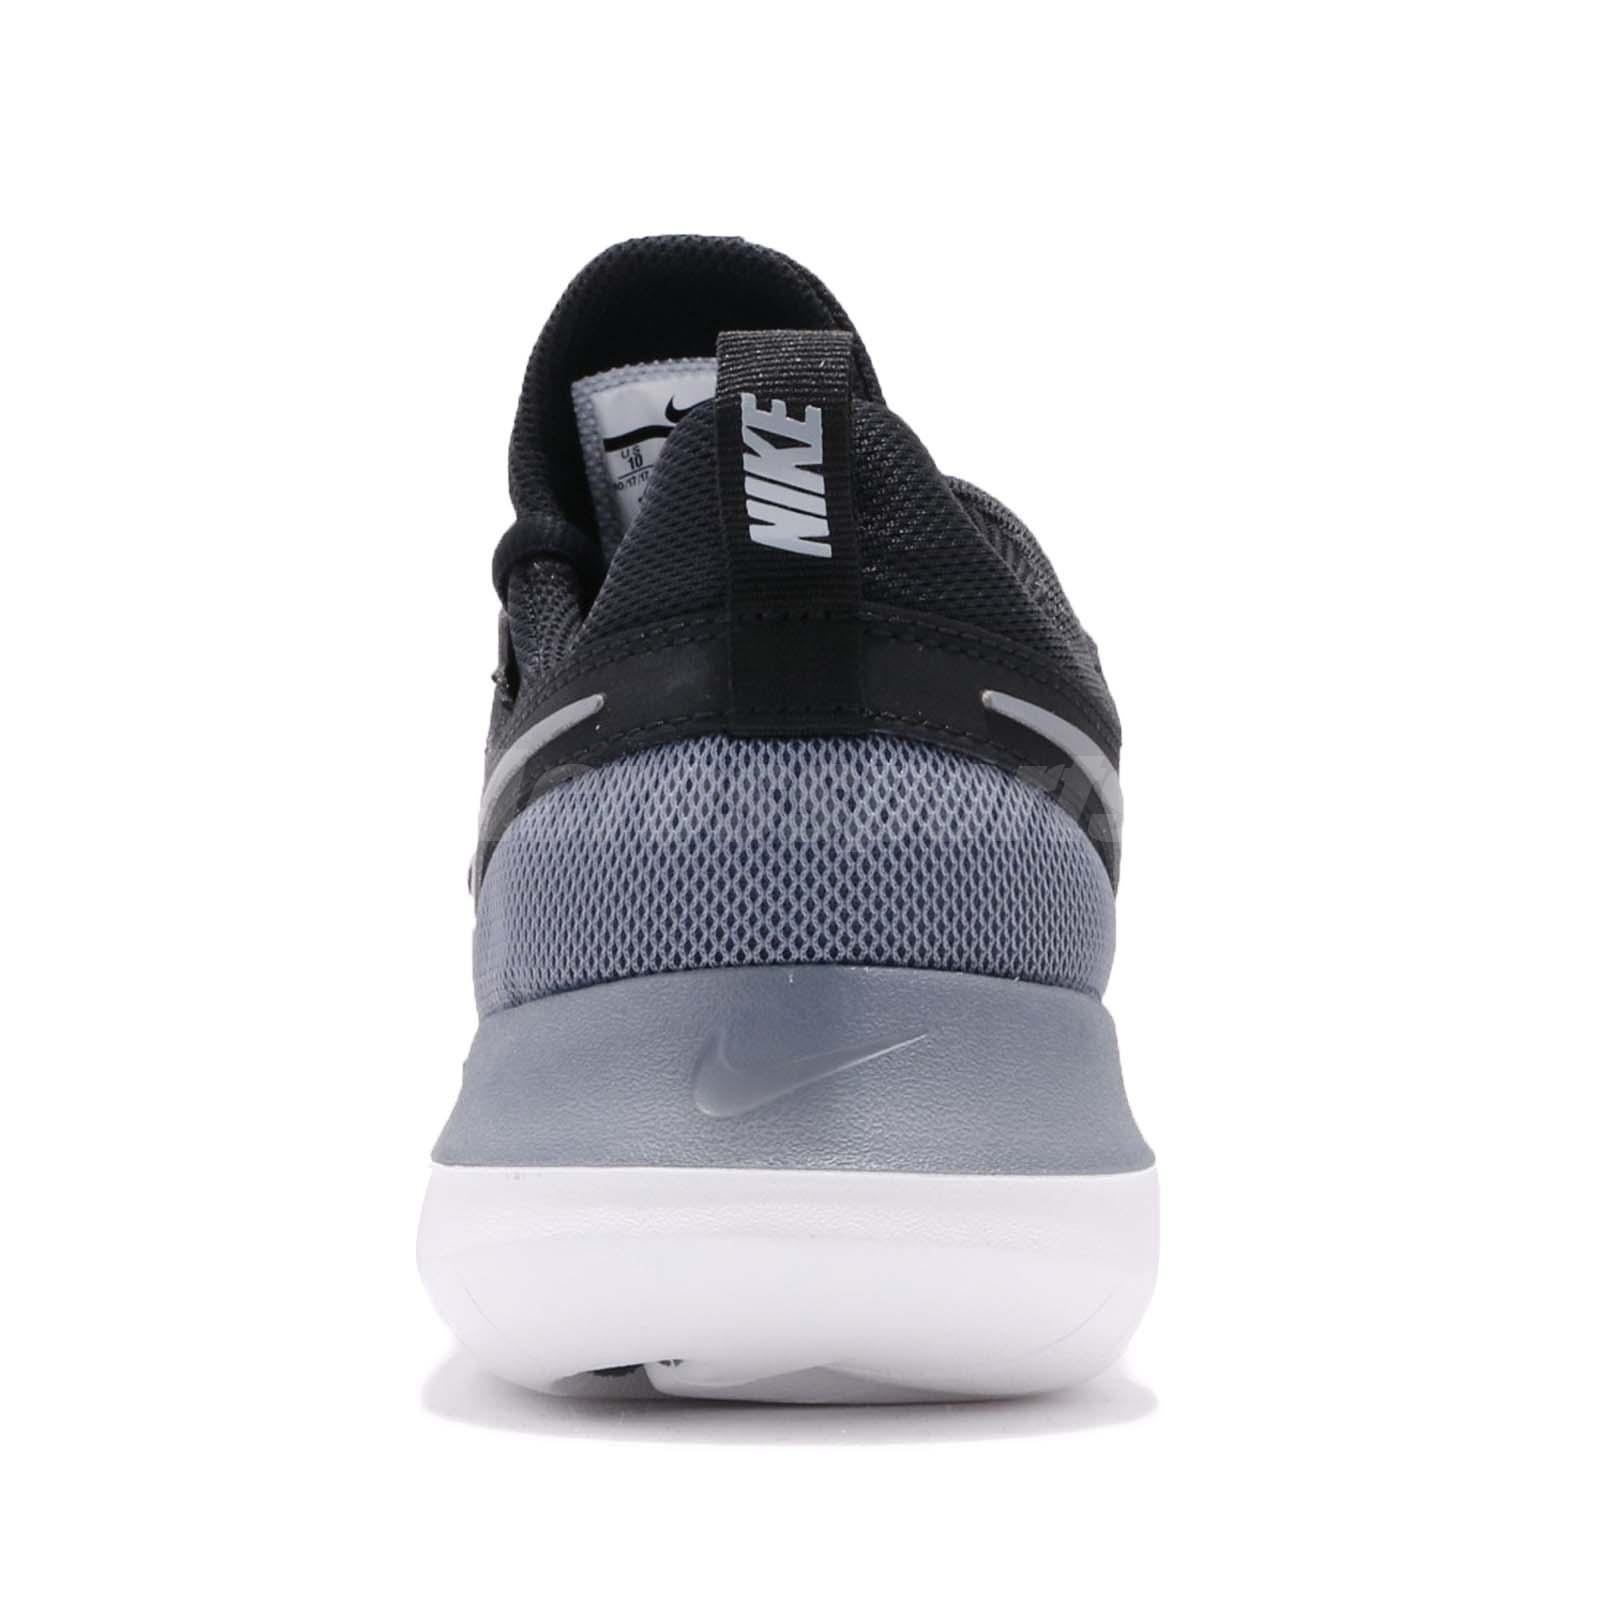 369c8ef1b0d8 Nike Tessen Black Grey White Men Running Casual Shoes Sneakers ...